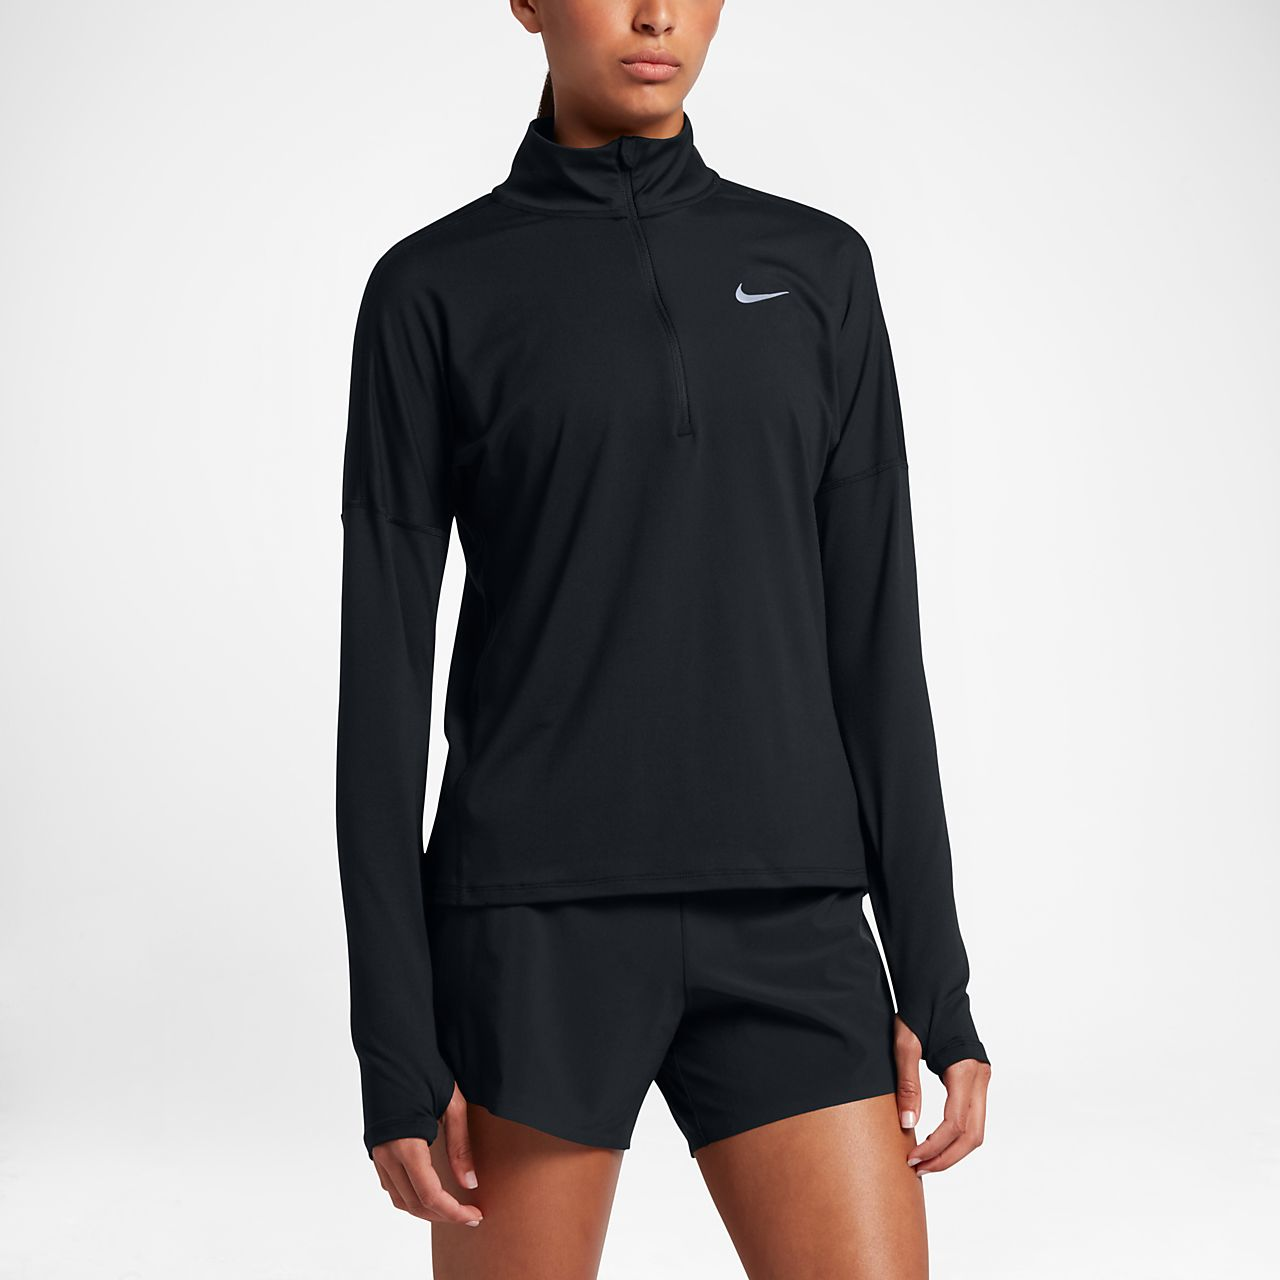 Nike Dri-FIT Element Hardlooptop met lange mouwen en halflange rits voor dames